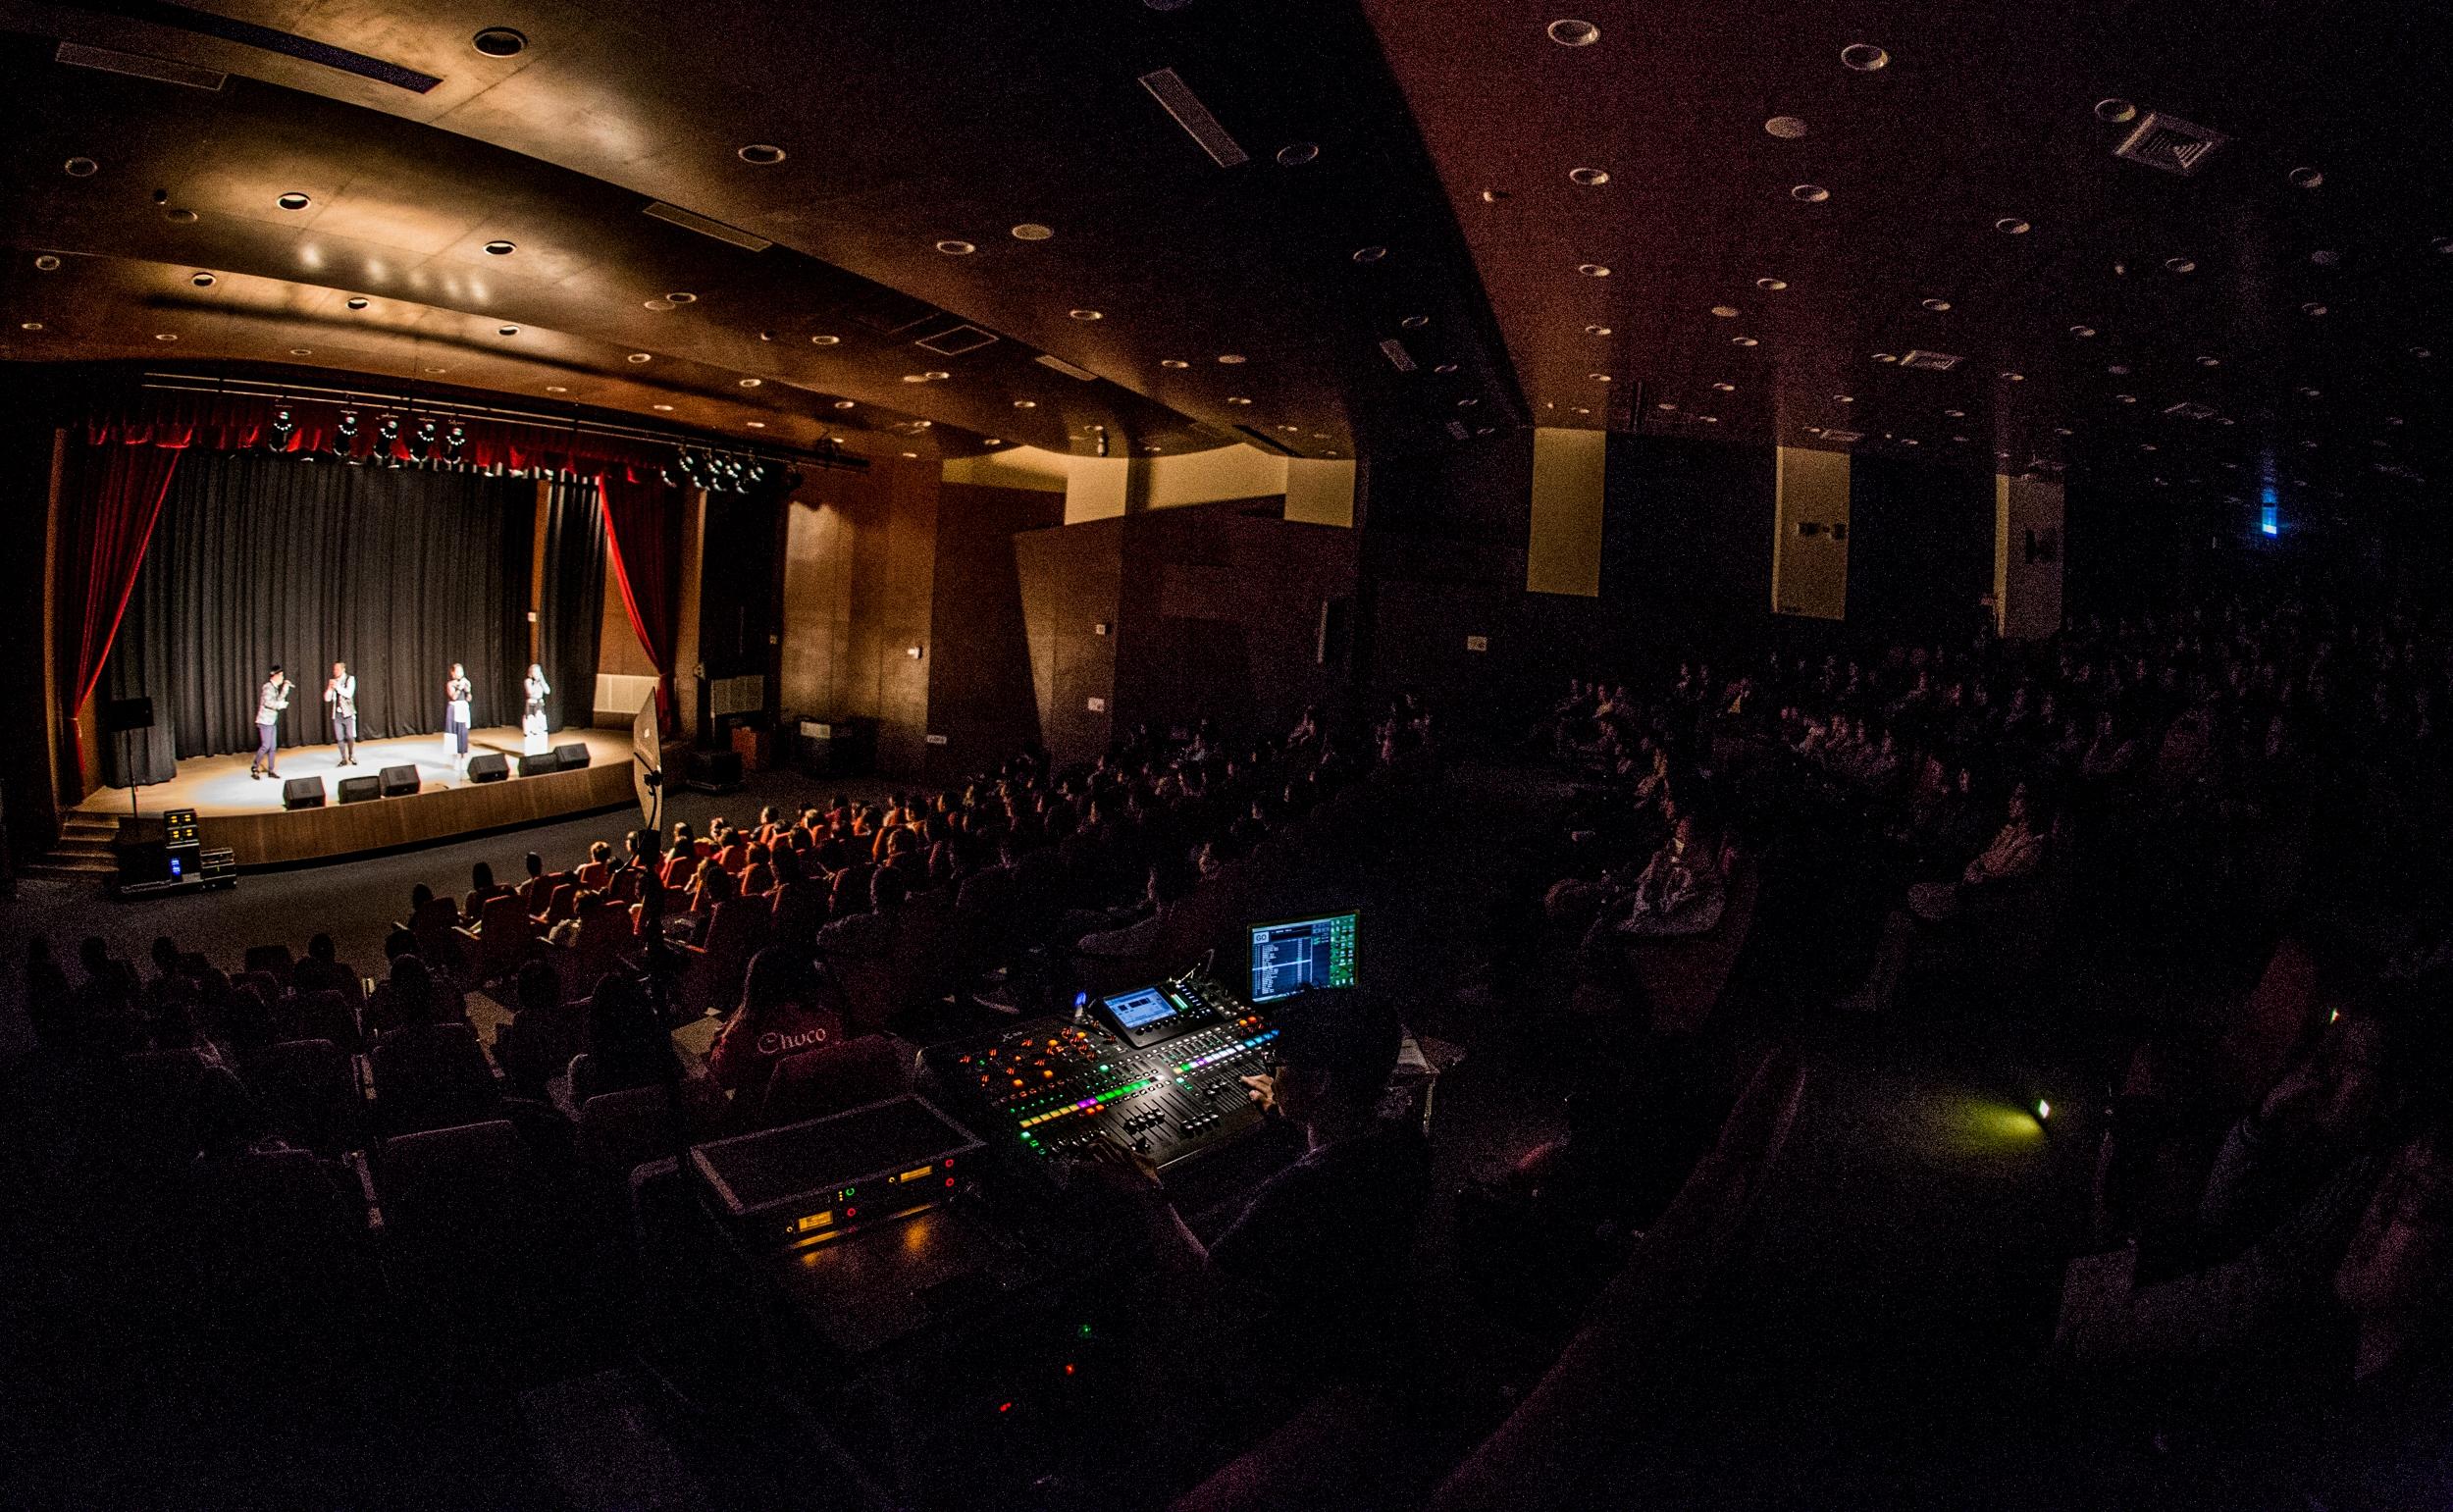 金卡世界巡回演出CHVOCALS WORLD TOUR - Passing Contemporary A Cappella Music to the world面向全世界传递现代阿卡贝拉